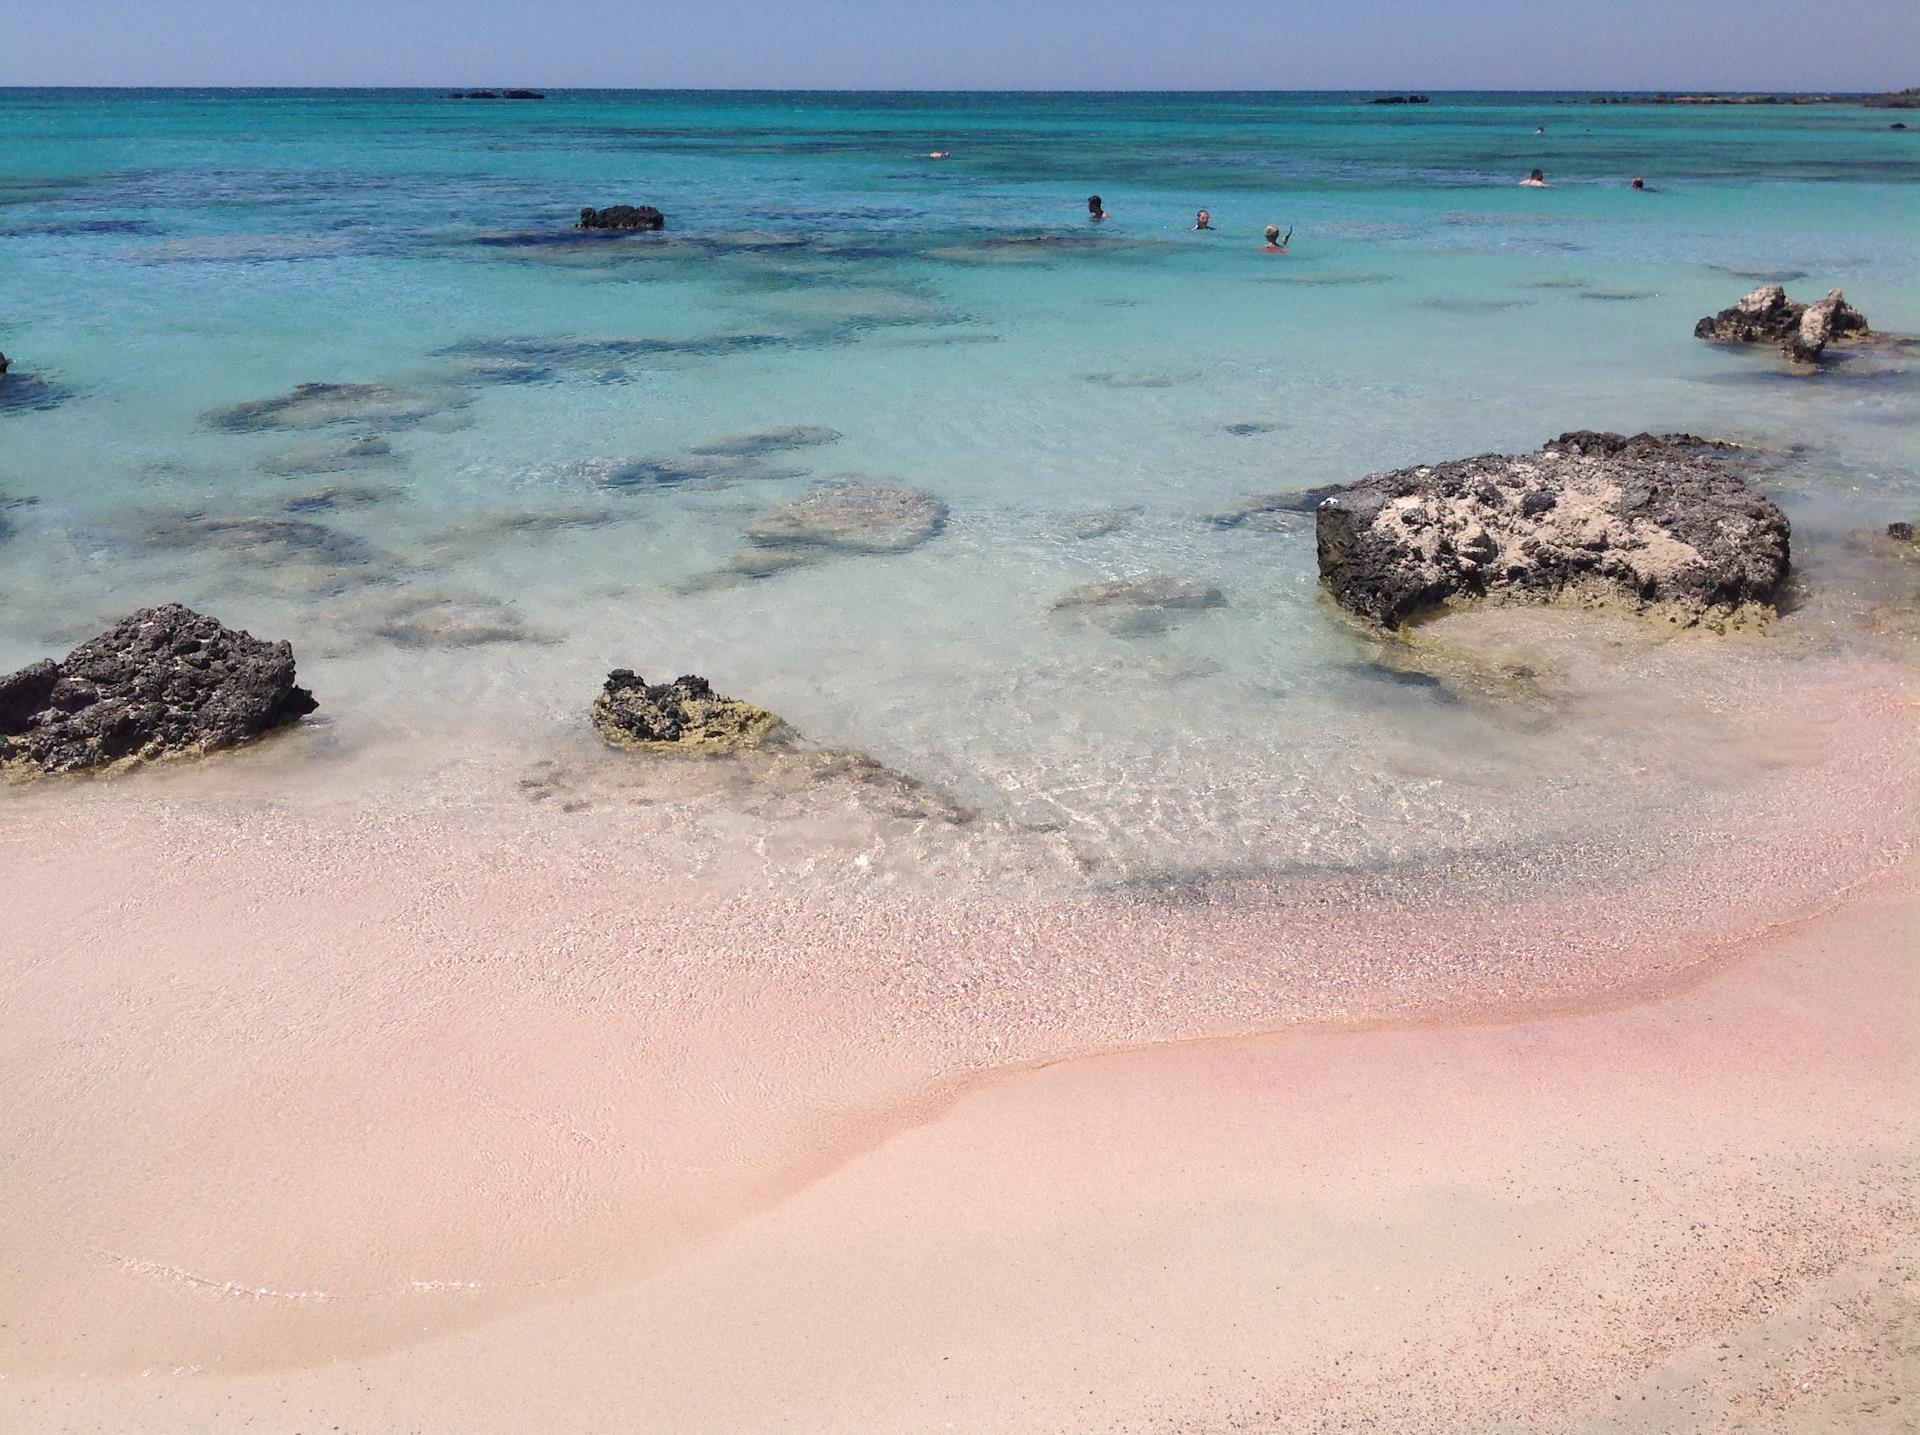 архипелаг элафониси фото основных